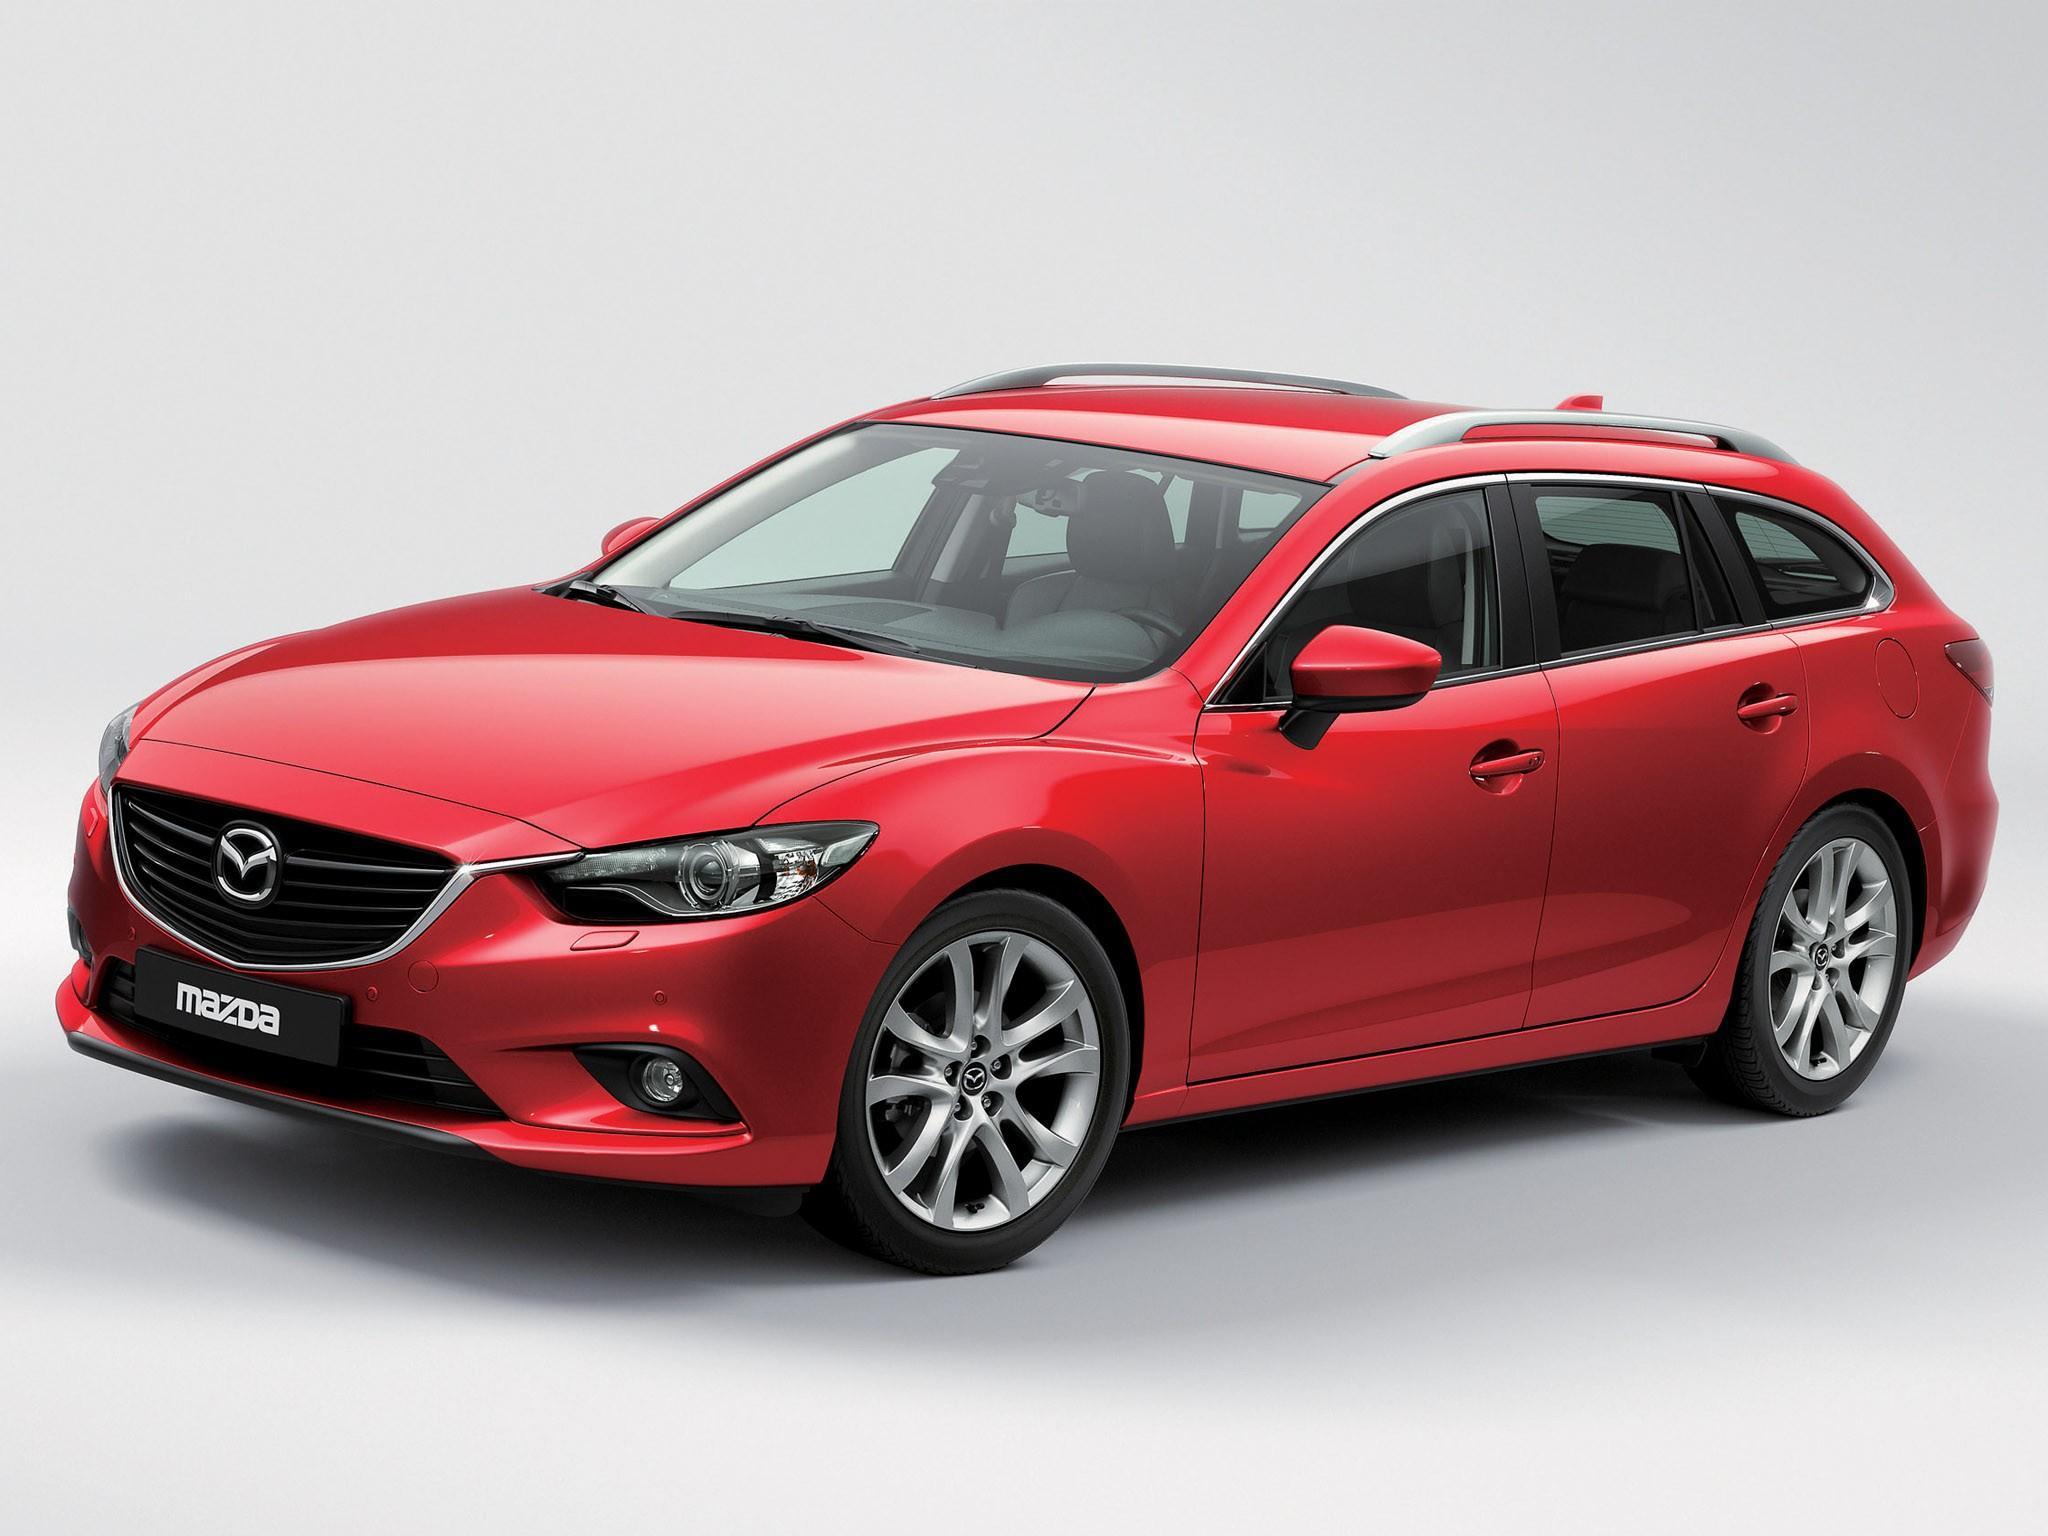 2013 Mazda 6 Wagon